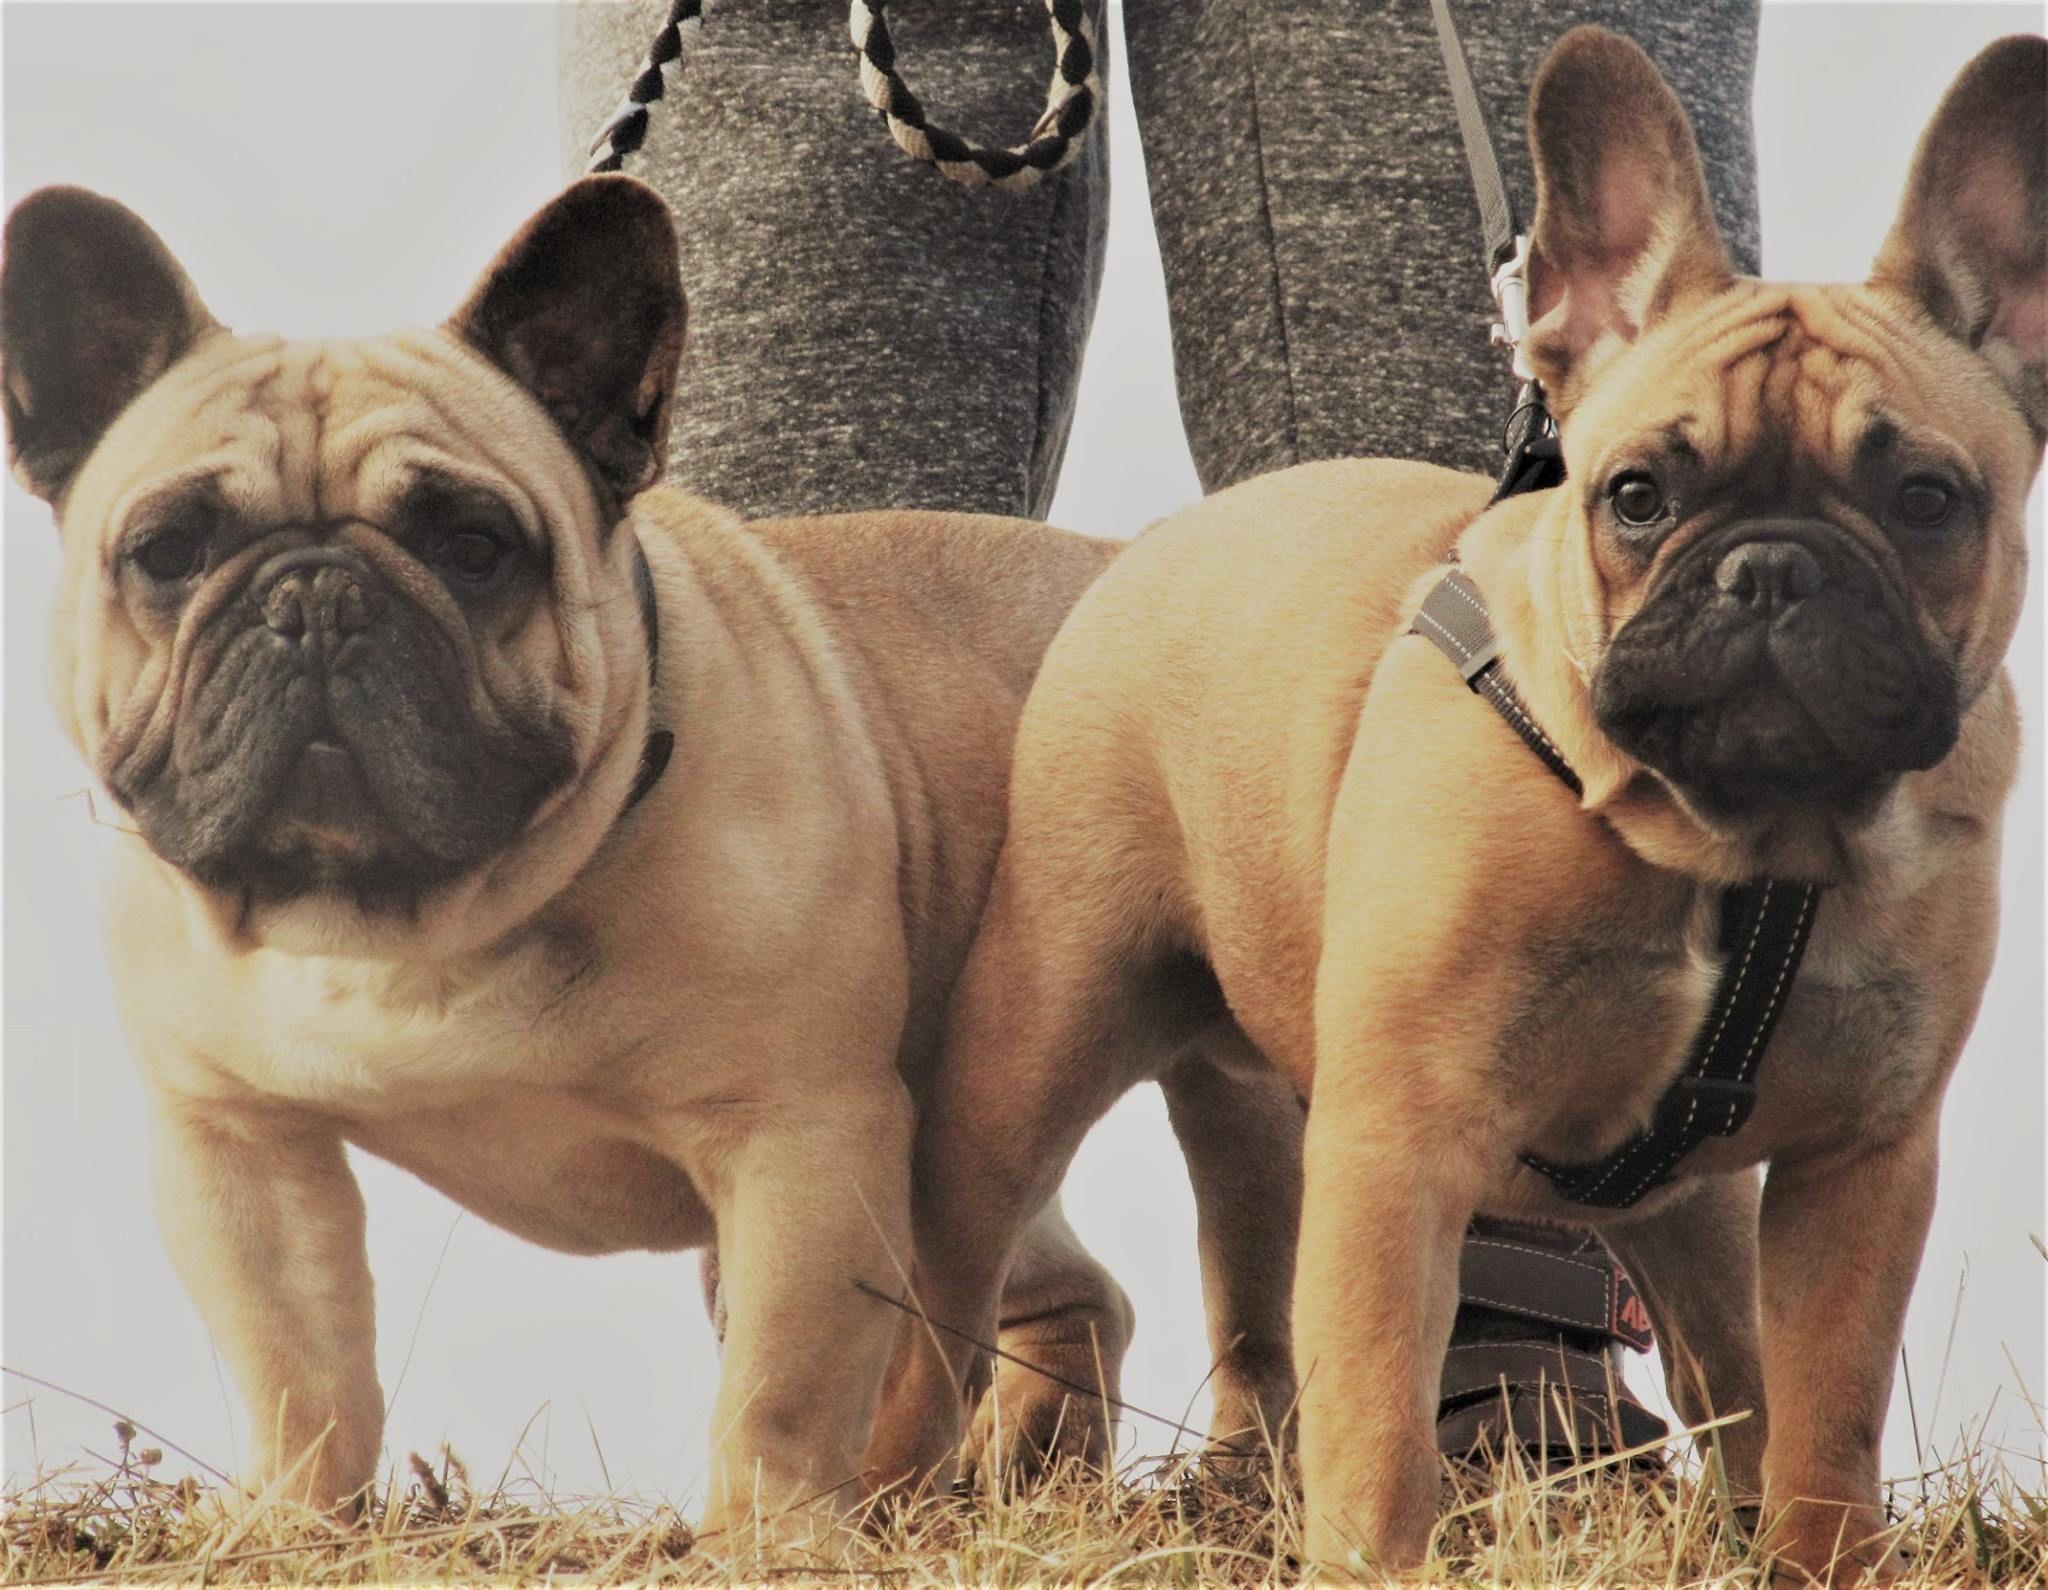 French Bulldogs Fotka Uzivatele Jana Civanova Nice Rose Ear And